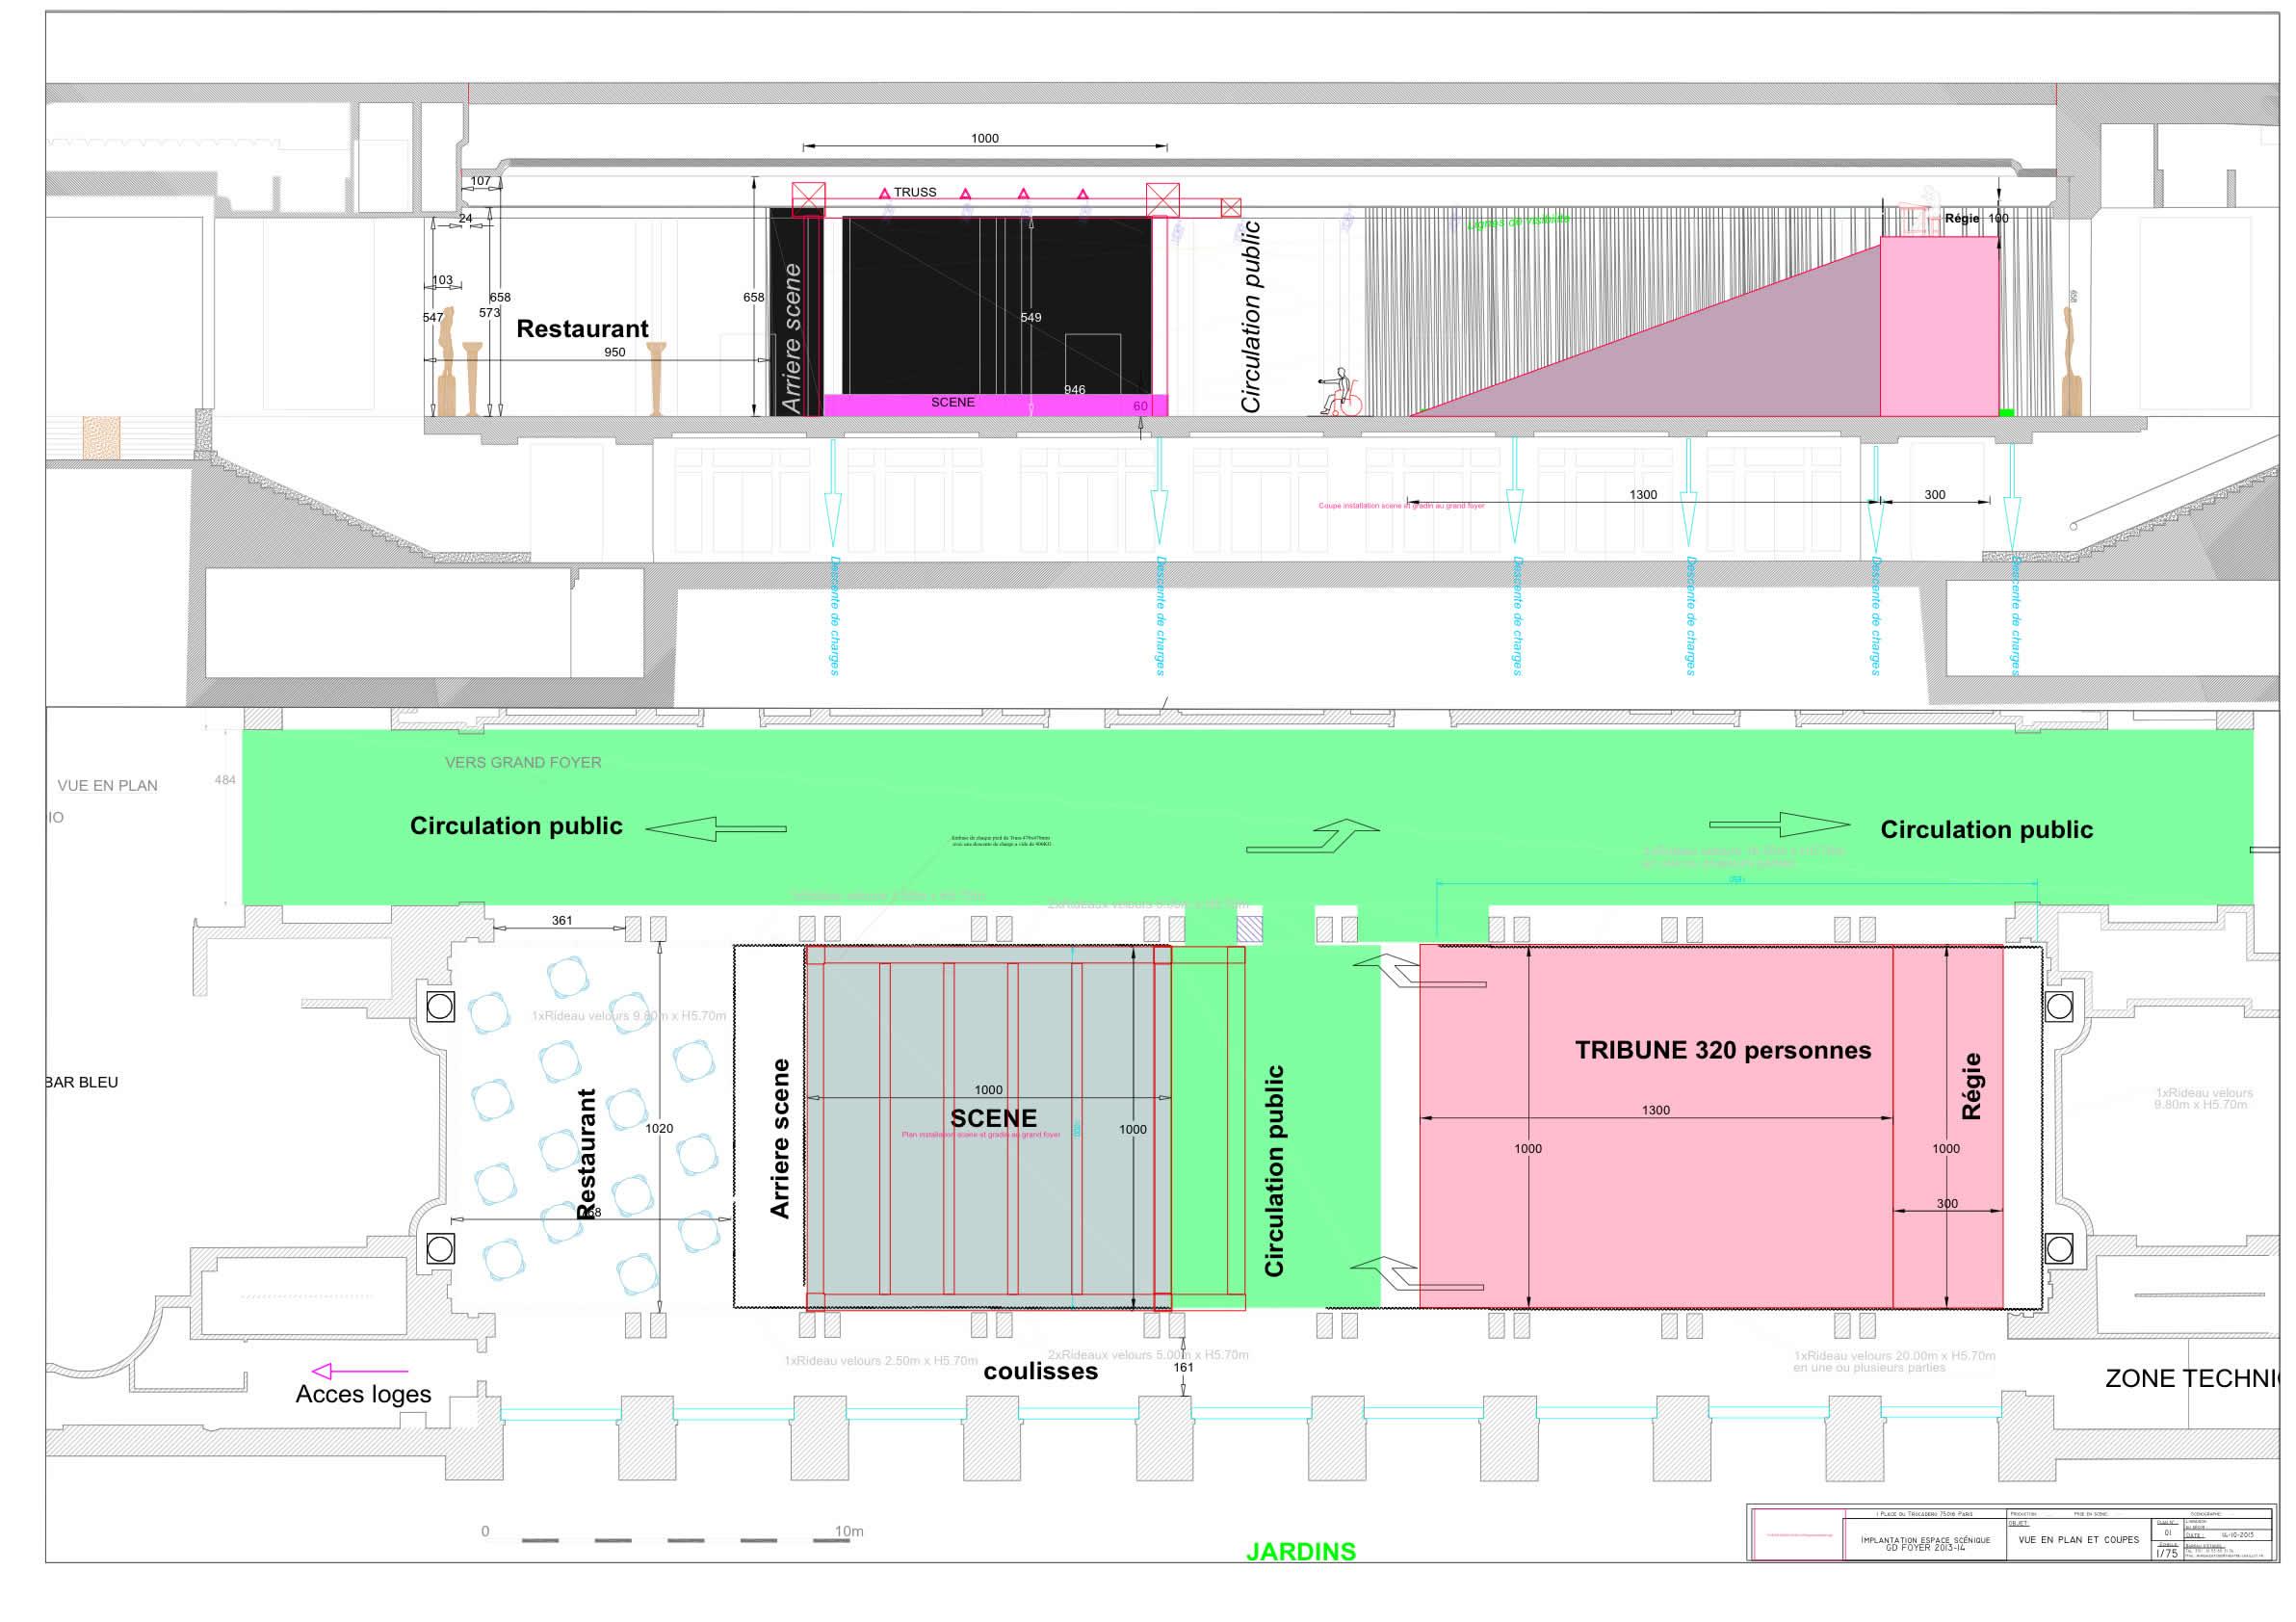 plan circulation public salle spectacle